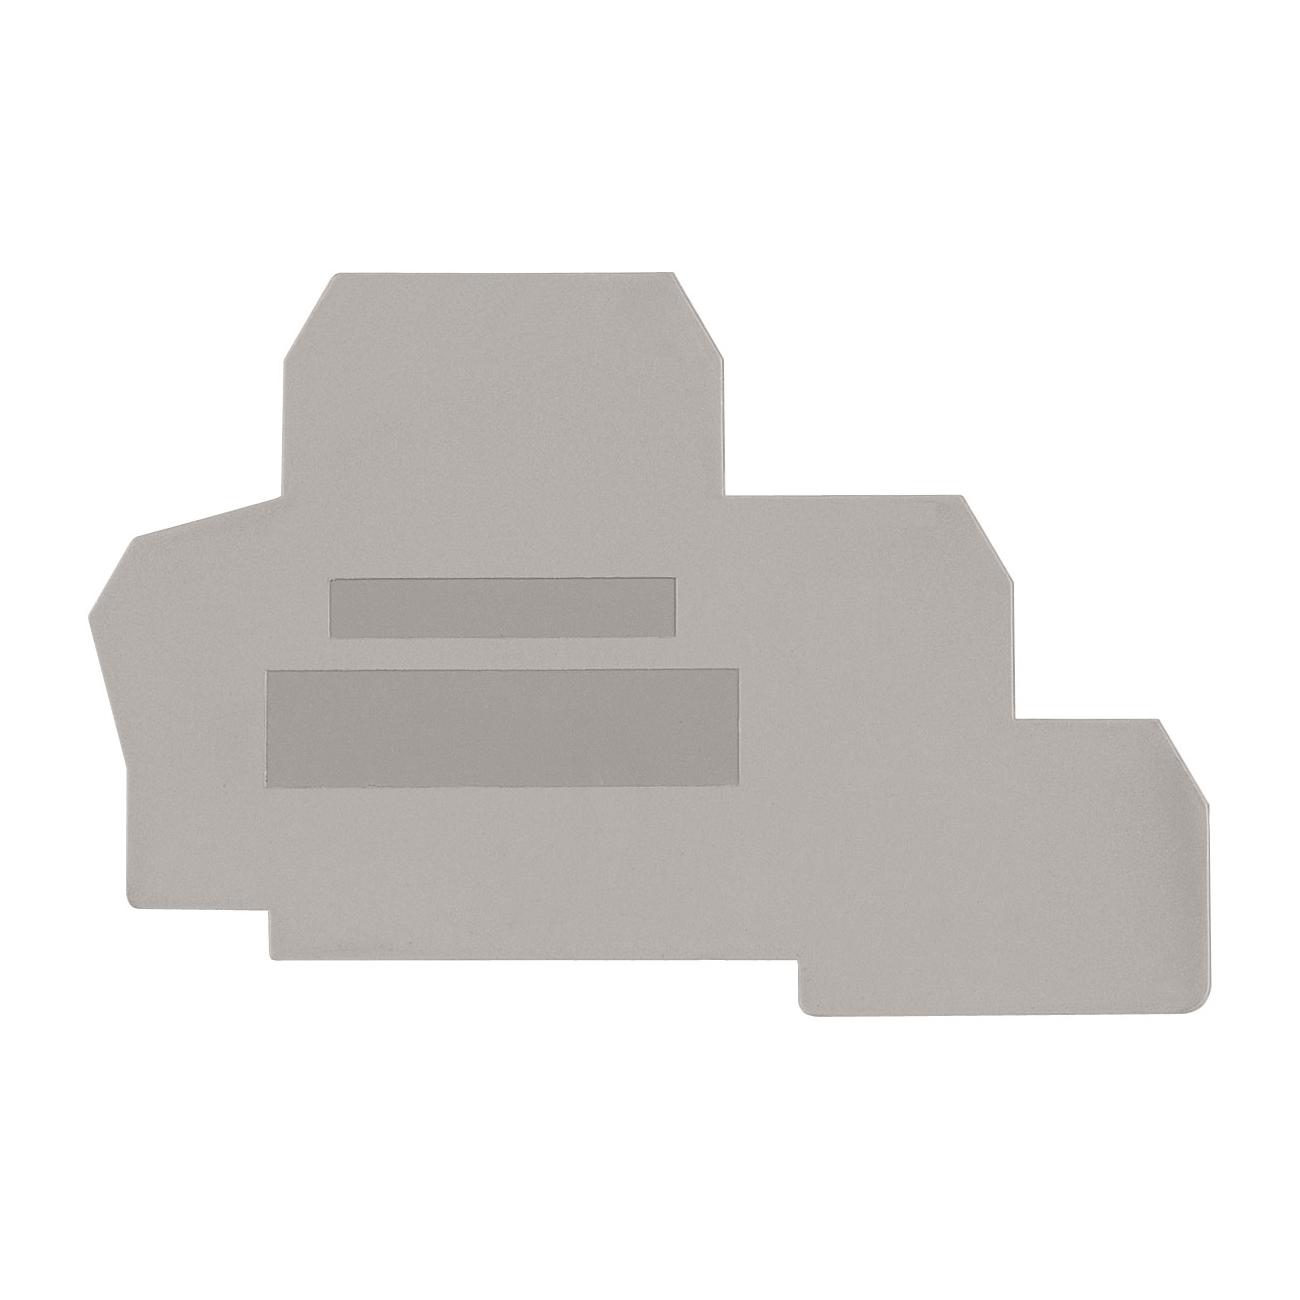 1 Stk Endplatte für Dreistockklemme Type PUK2T IK680202--